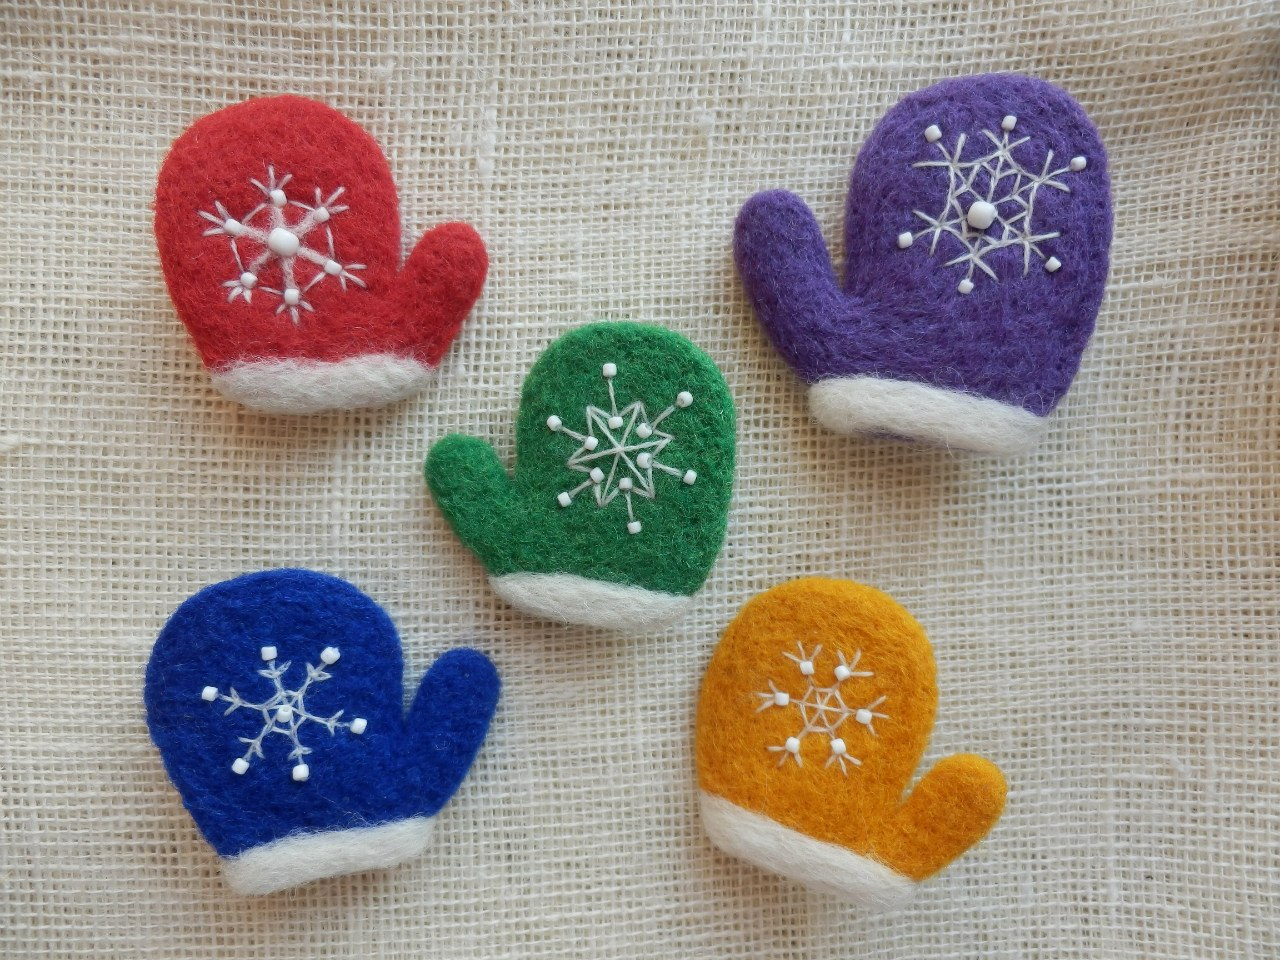 Вышивки снежинки на варежках